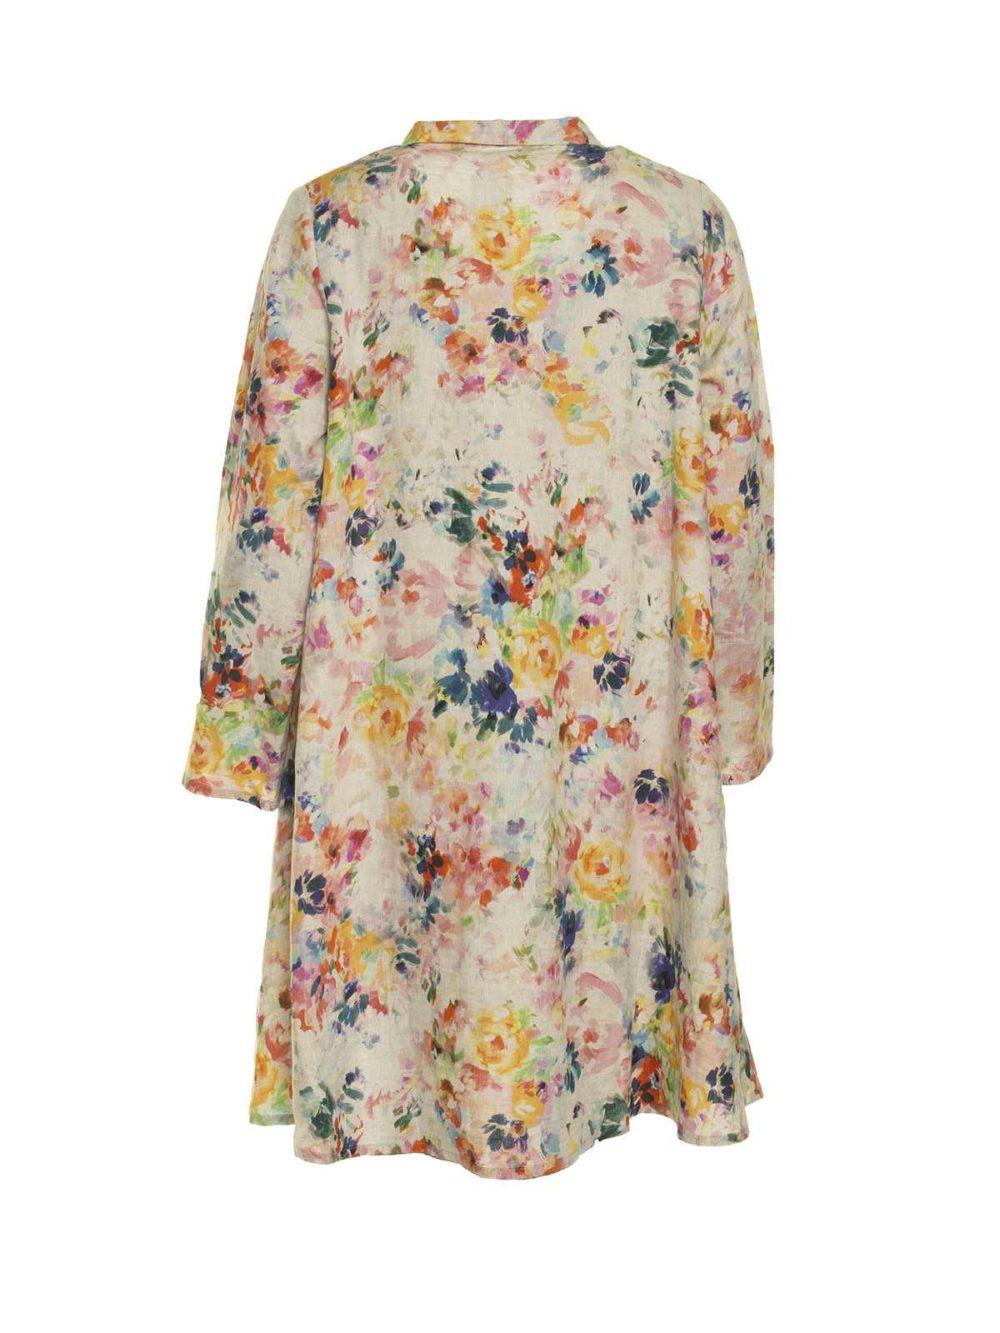 Kemal Shirt Ralston Katie Kerr Women's Clothing